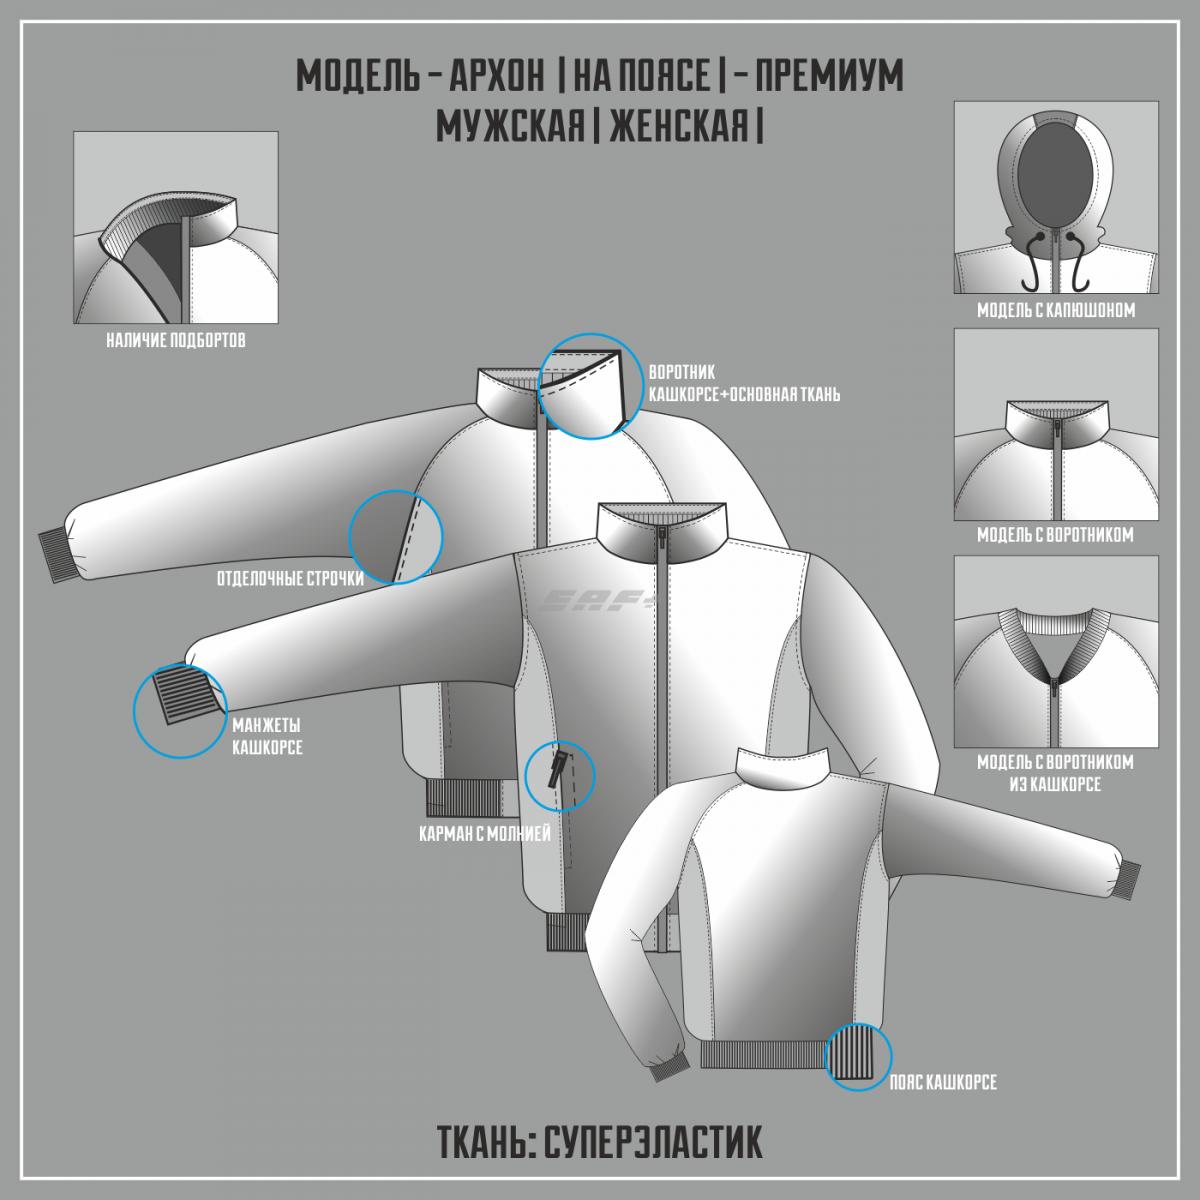 АРХОН-СУПЕРЭЛАСТИК ПРЕМИУМ куртка на поясе (Частичная сублимация)